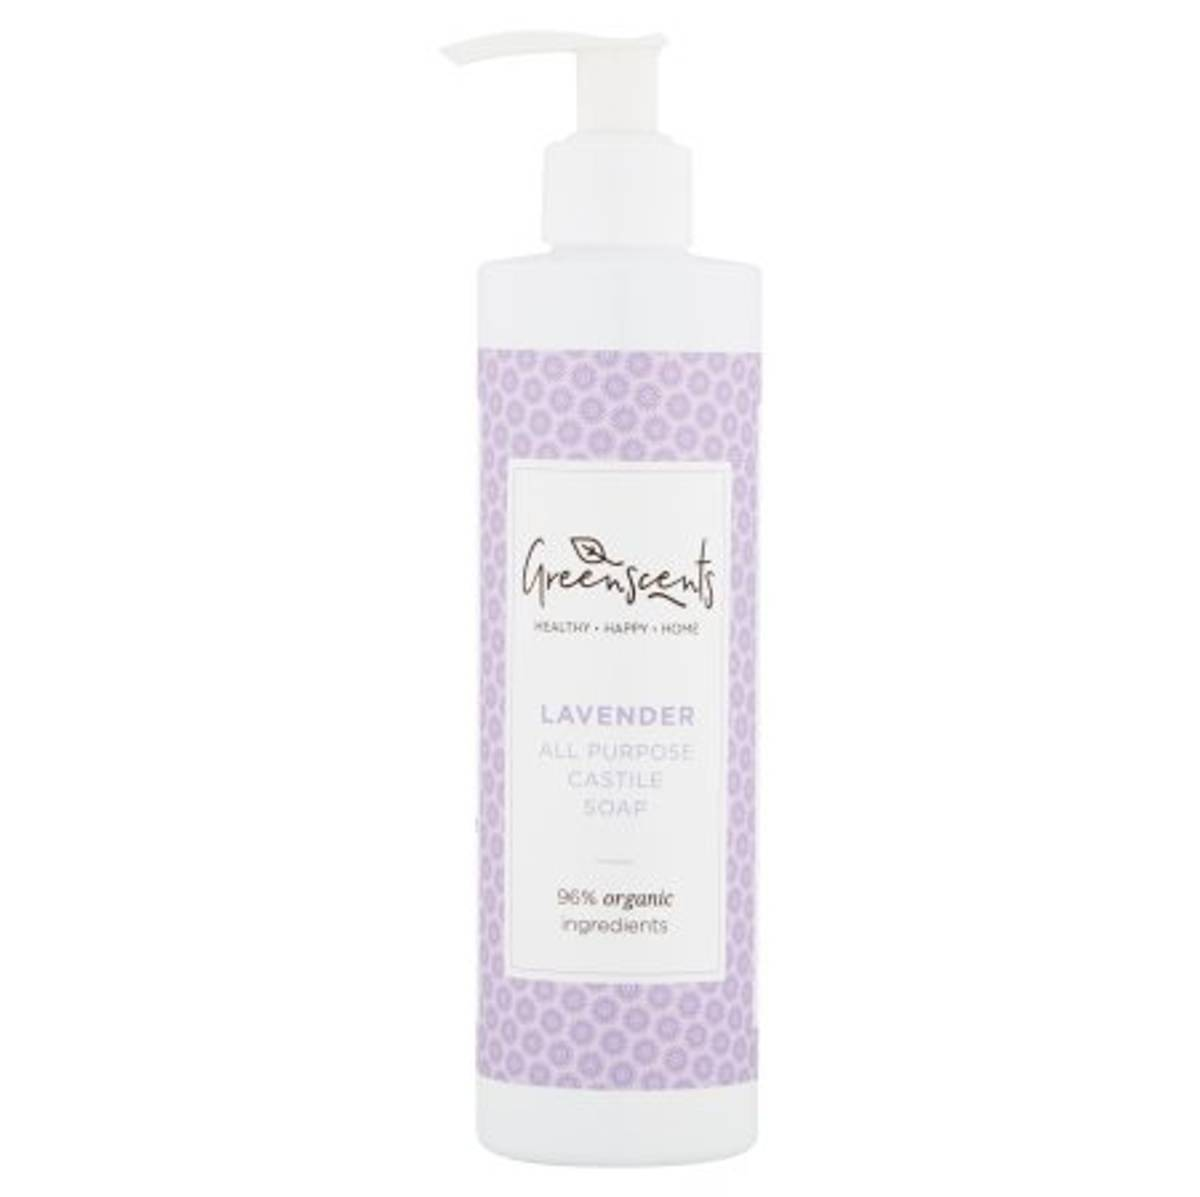 Castilesåpe Lavendel 300 ml / Greenscents